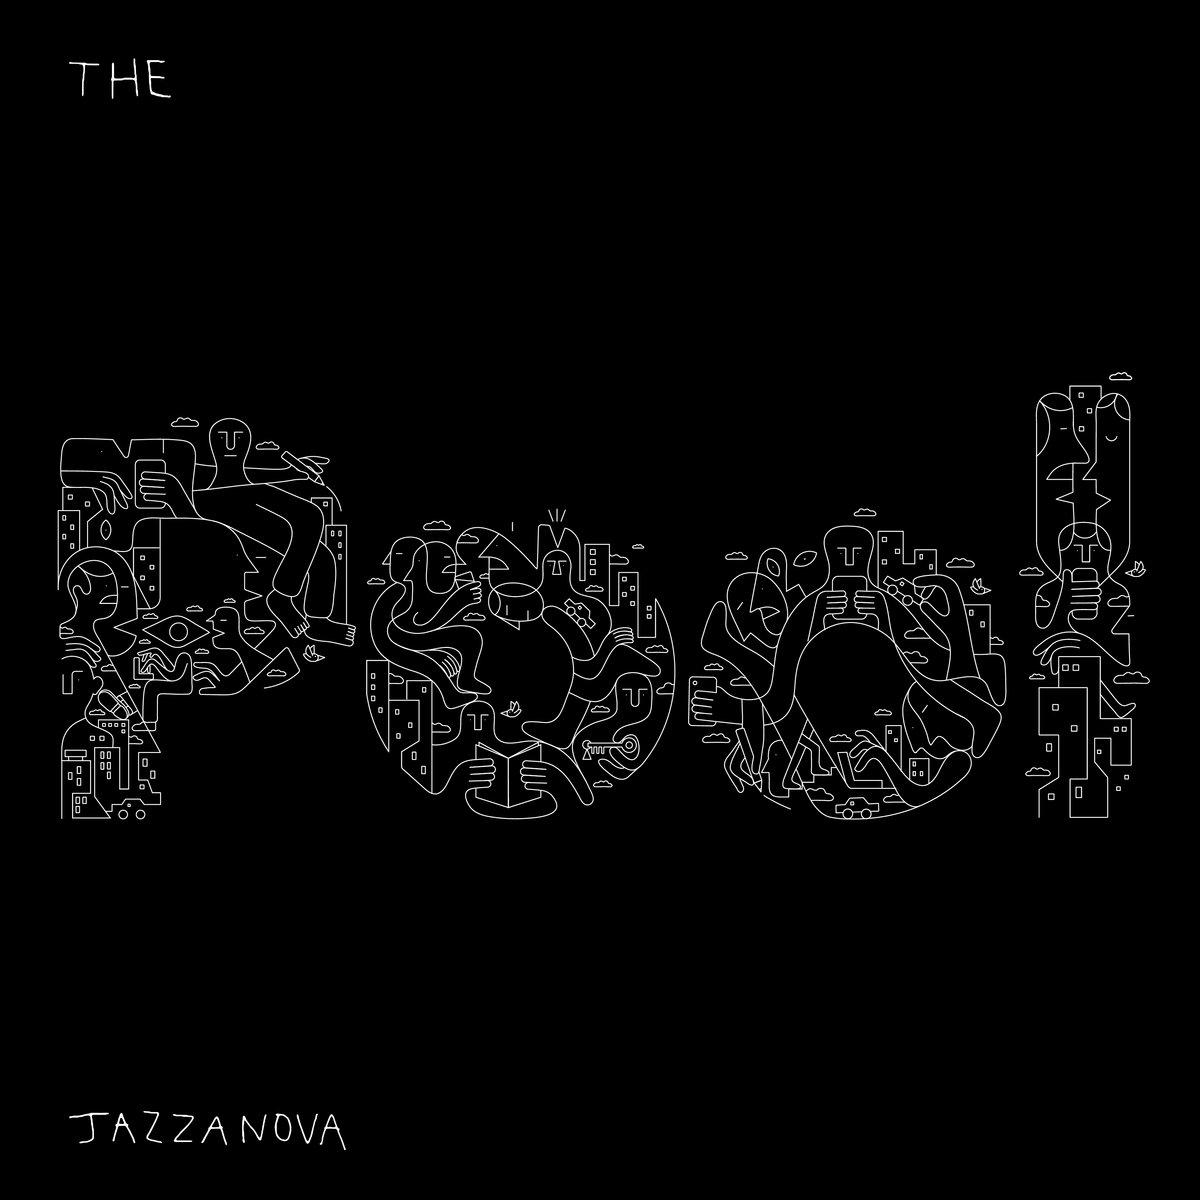 JAZZANOVA – Pool